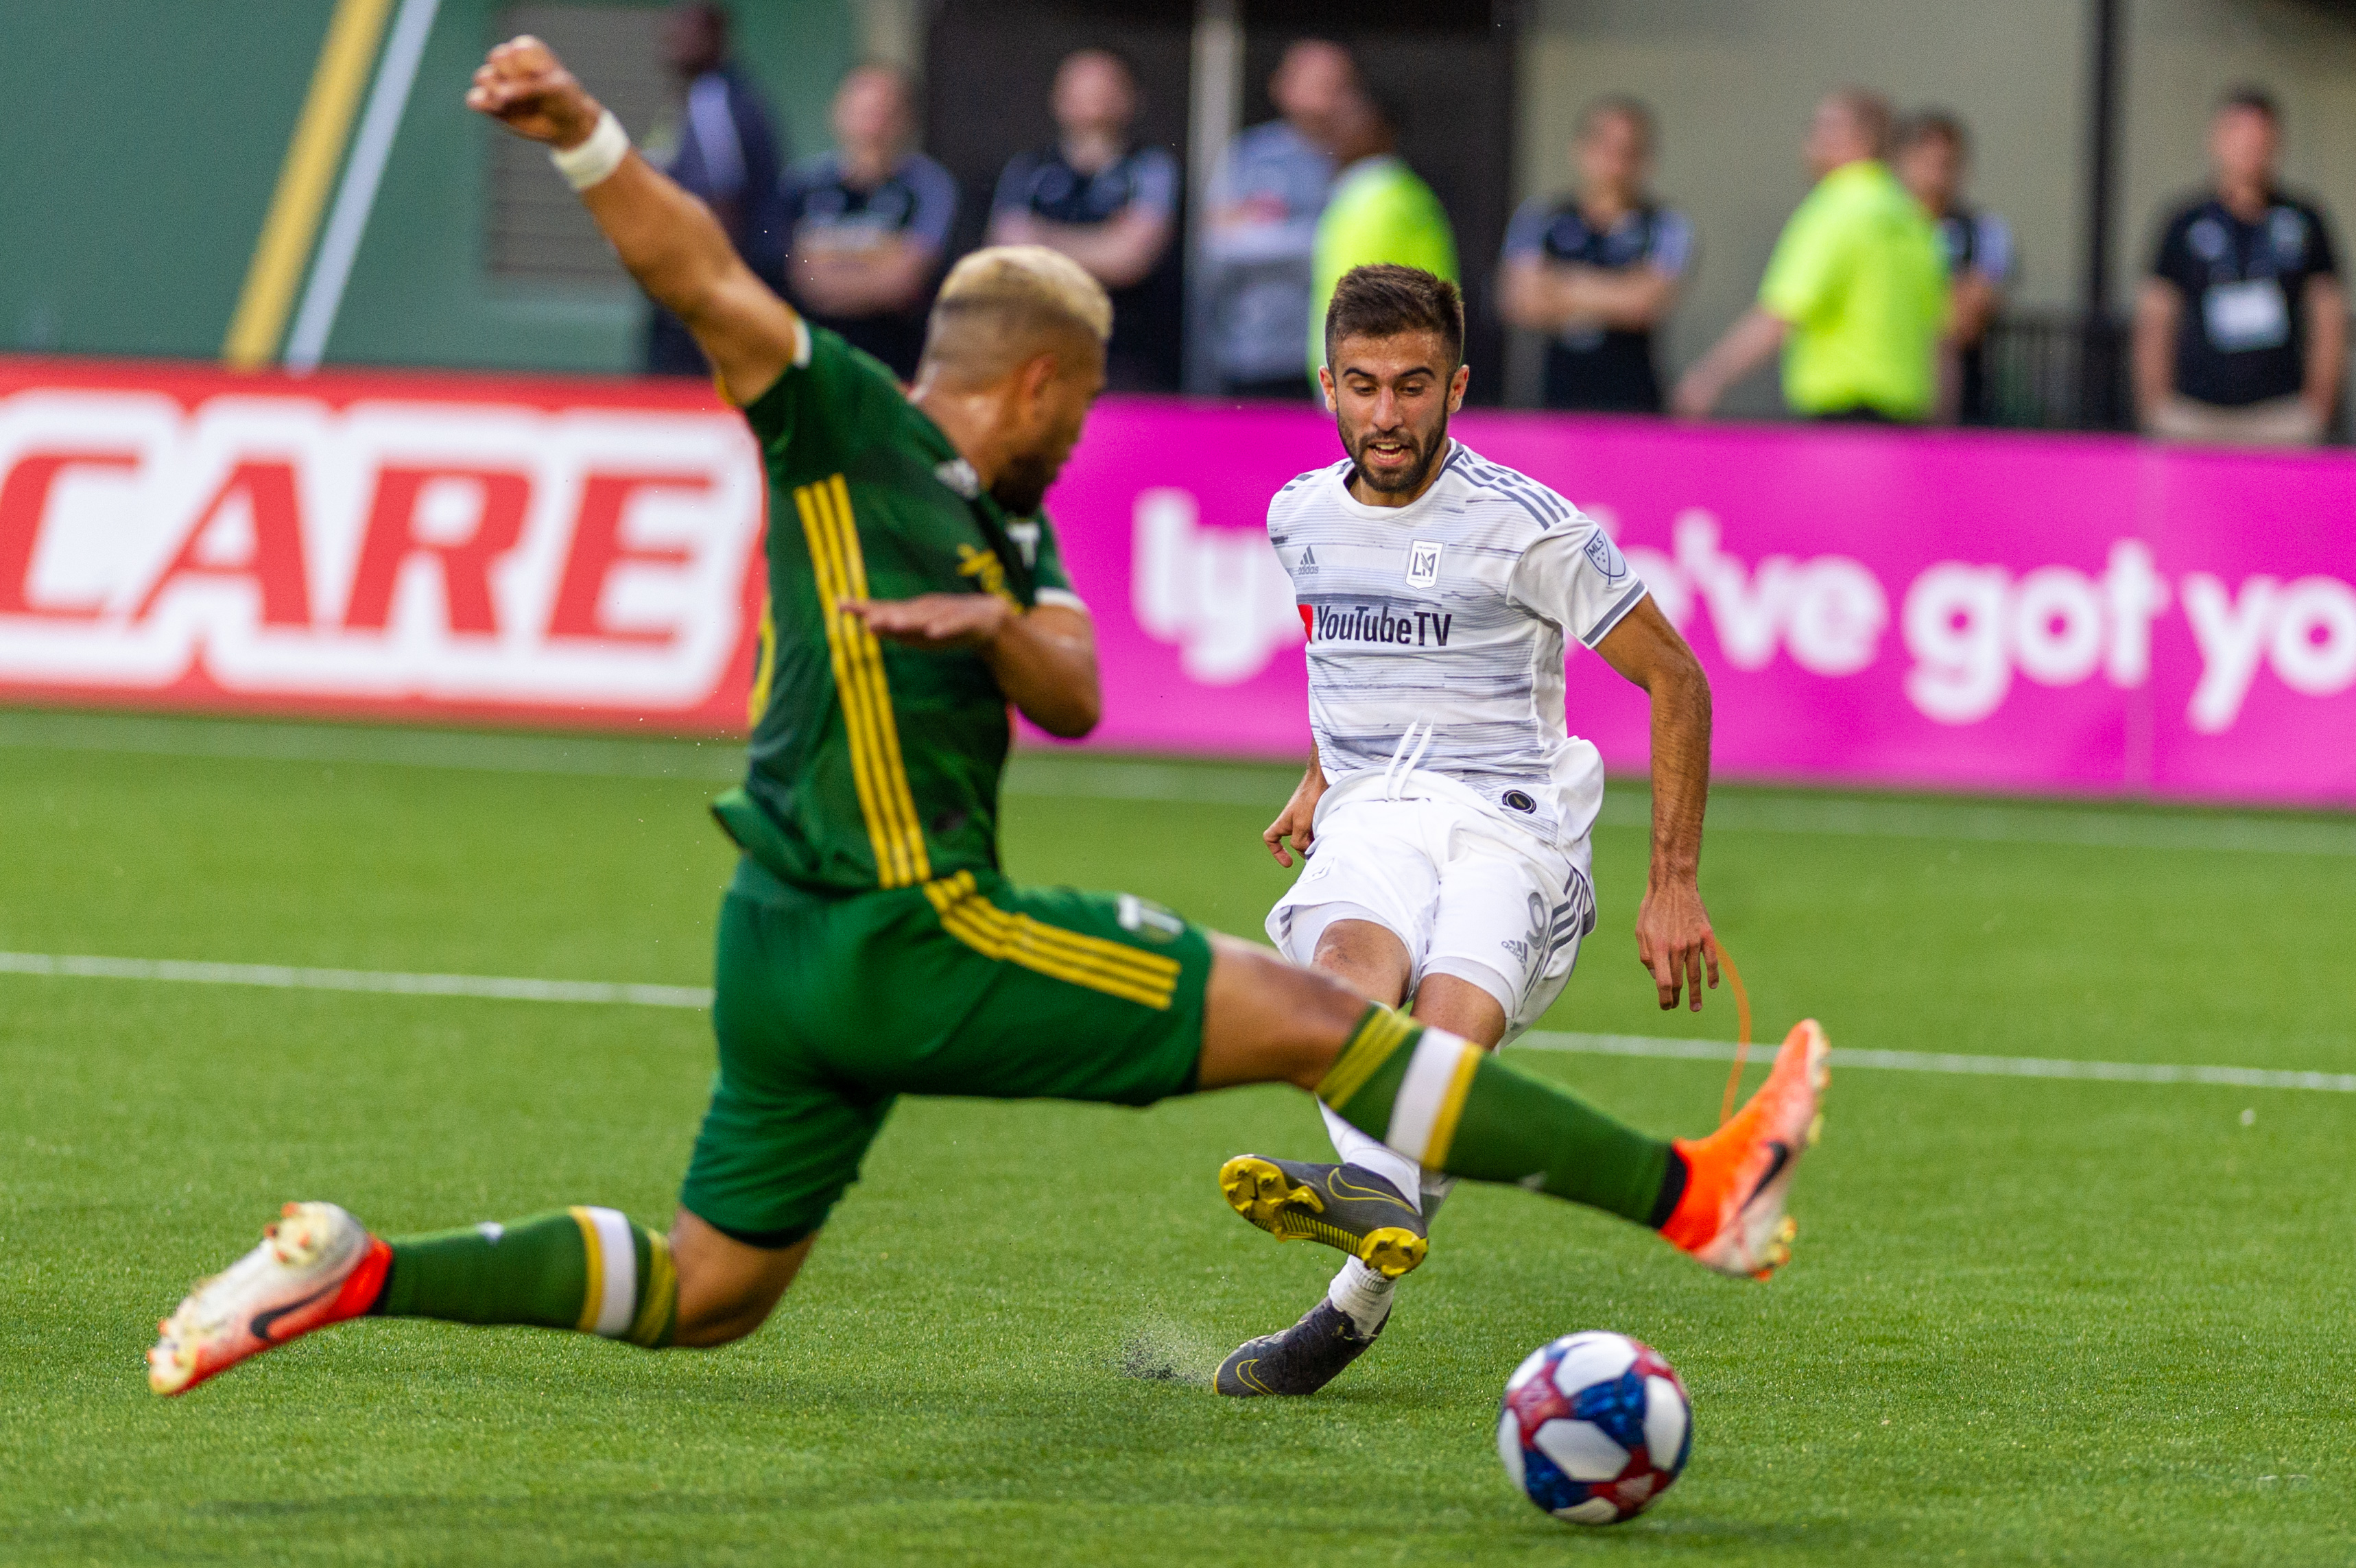 SOCCER: JUN 01 MLS - LAFC at Portland Timbers